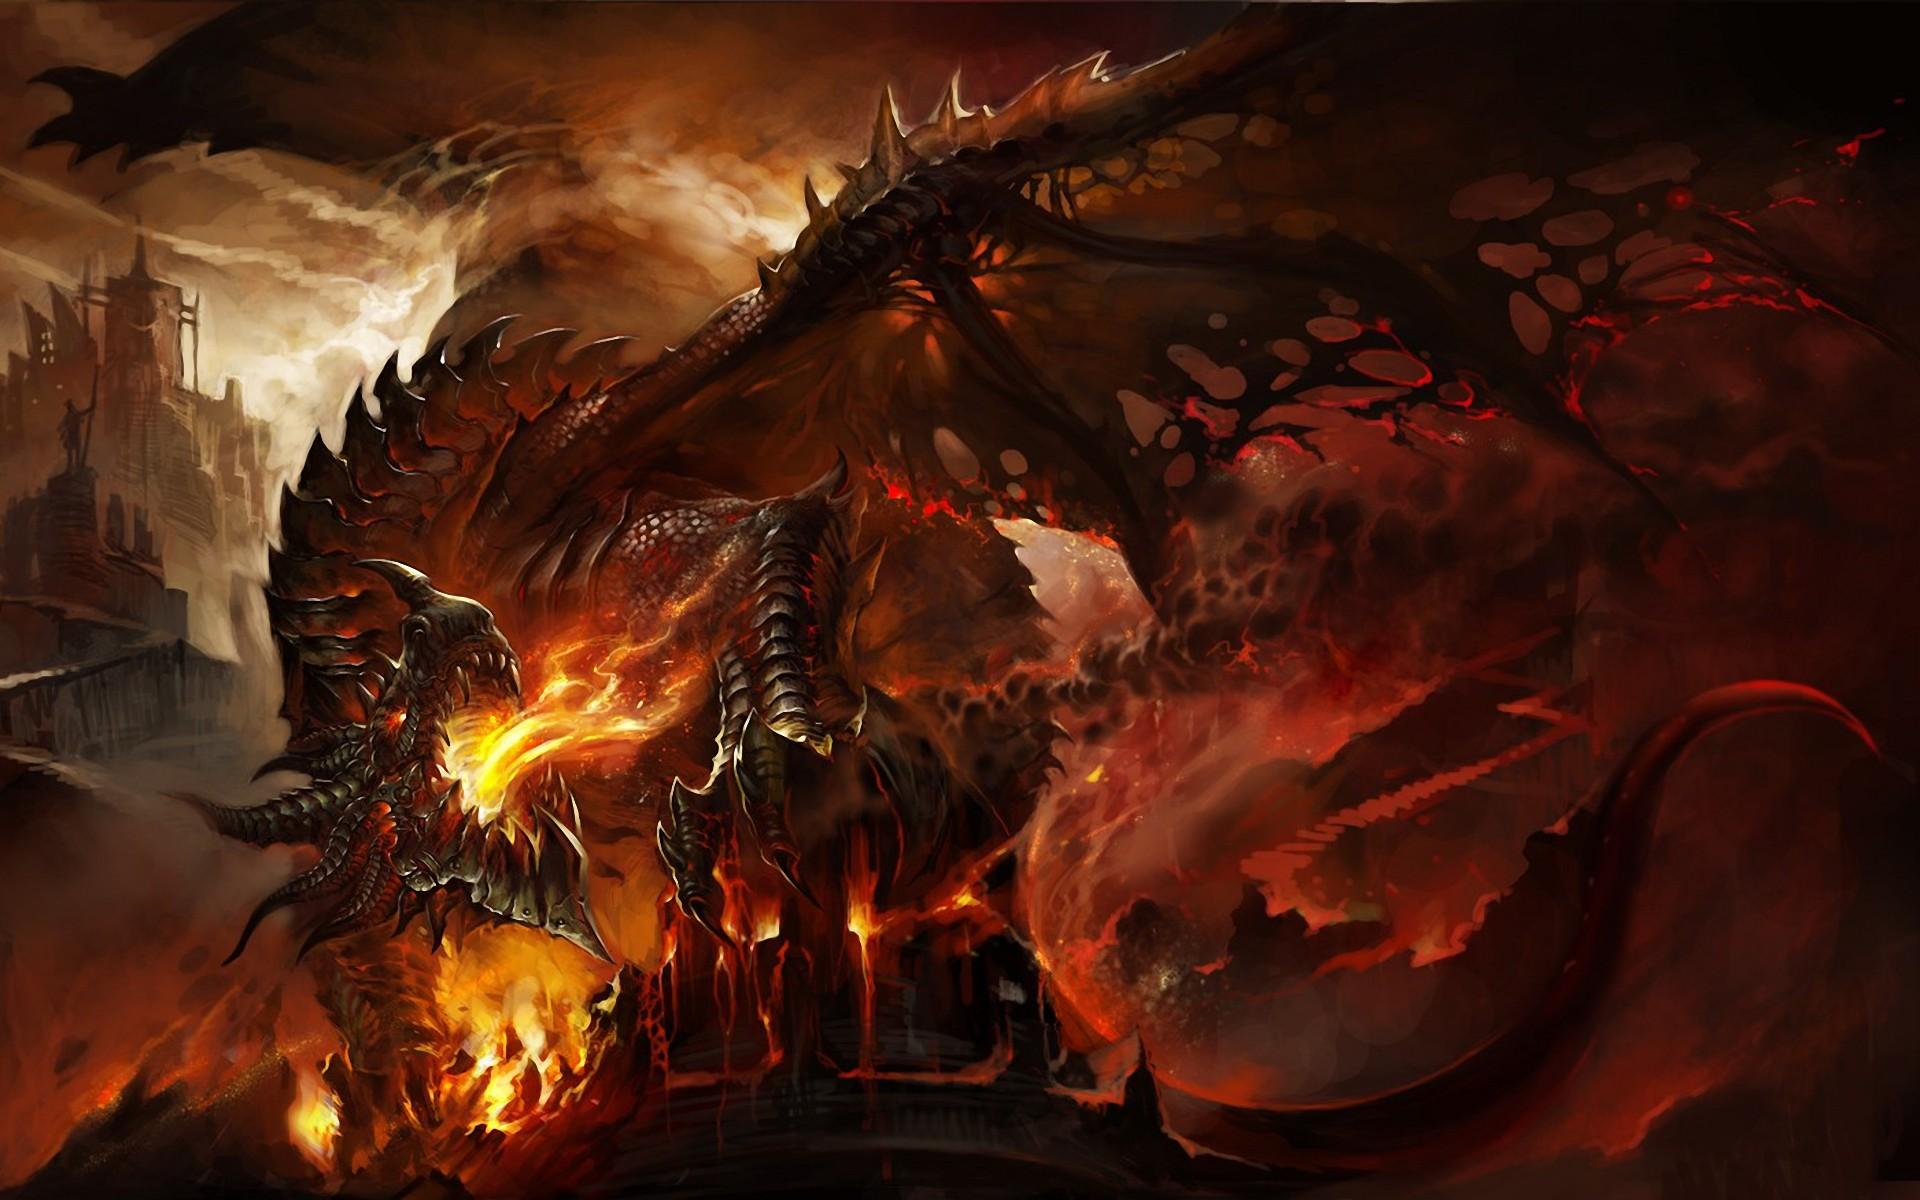 Abstract Dragons Wallpaper 1920x1200 Fire Fantasy